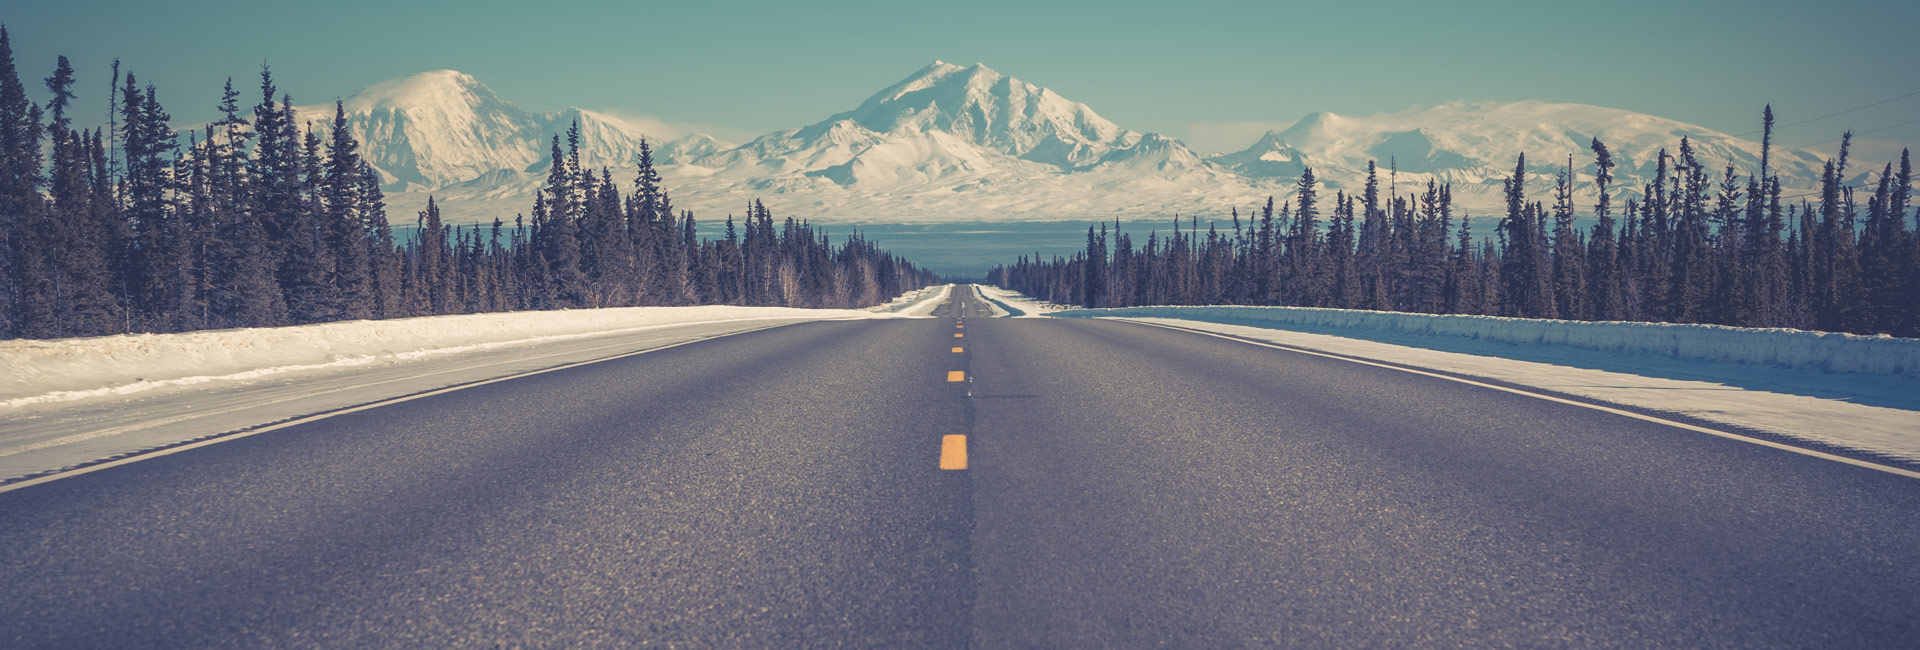 Full-Hero-Road-Mountain